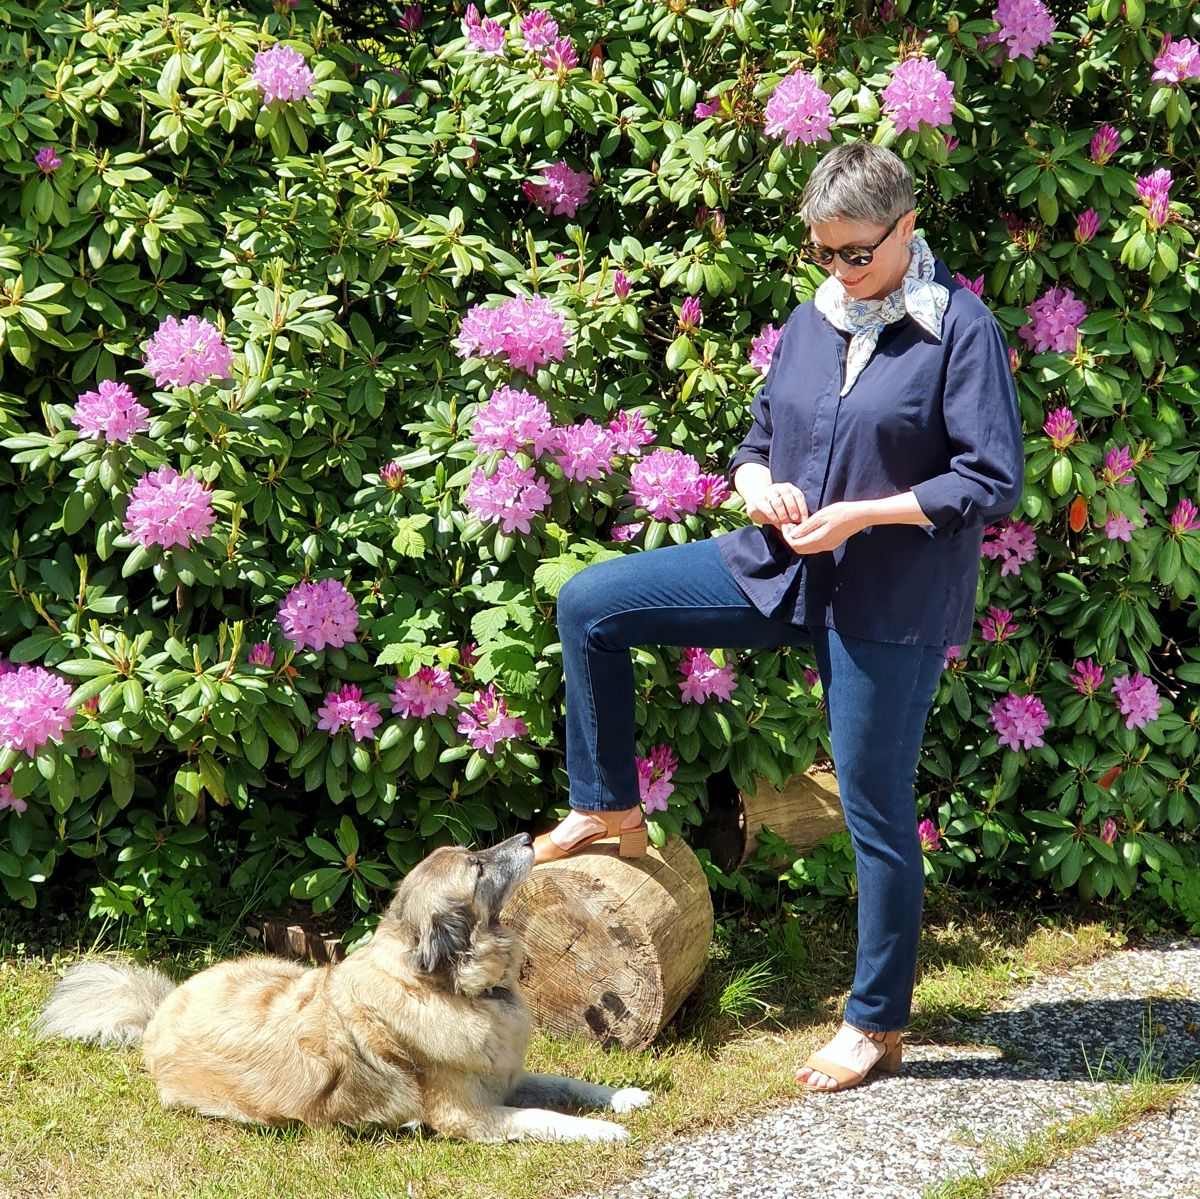 Ines Meyrose - Outfit 2021 - Frühlingseinheitslook - persönliche Uniform - dunkelblaue Bluse, dunkelblaue Jeans, Sandalen - Ü50 Bloggerin mit Hund Paul